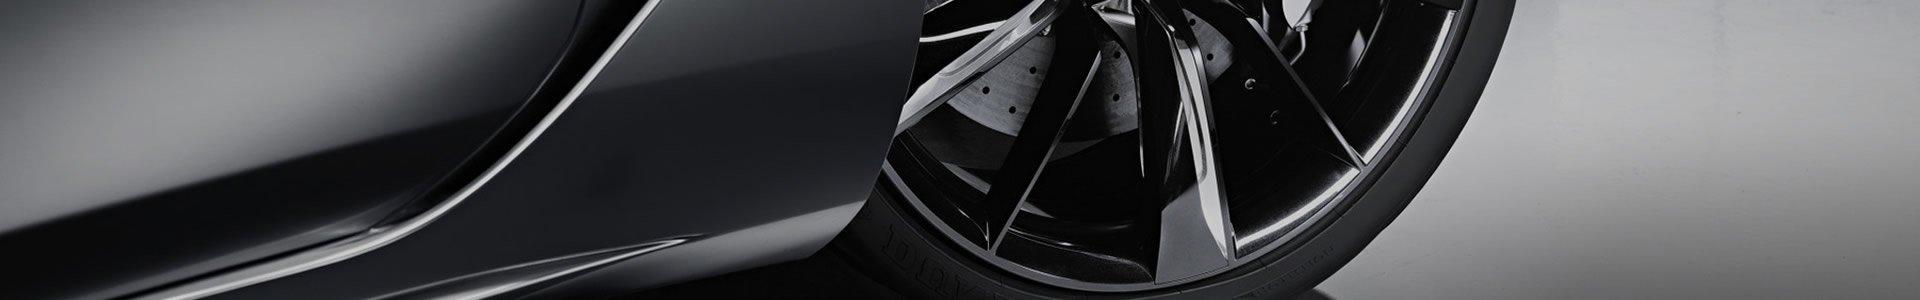 3D printed tools cut titanium, win top innovation prize